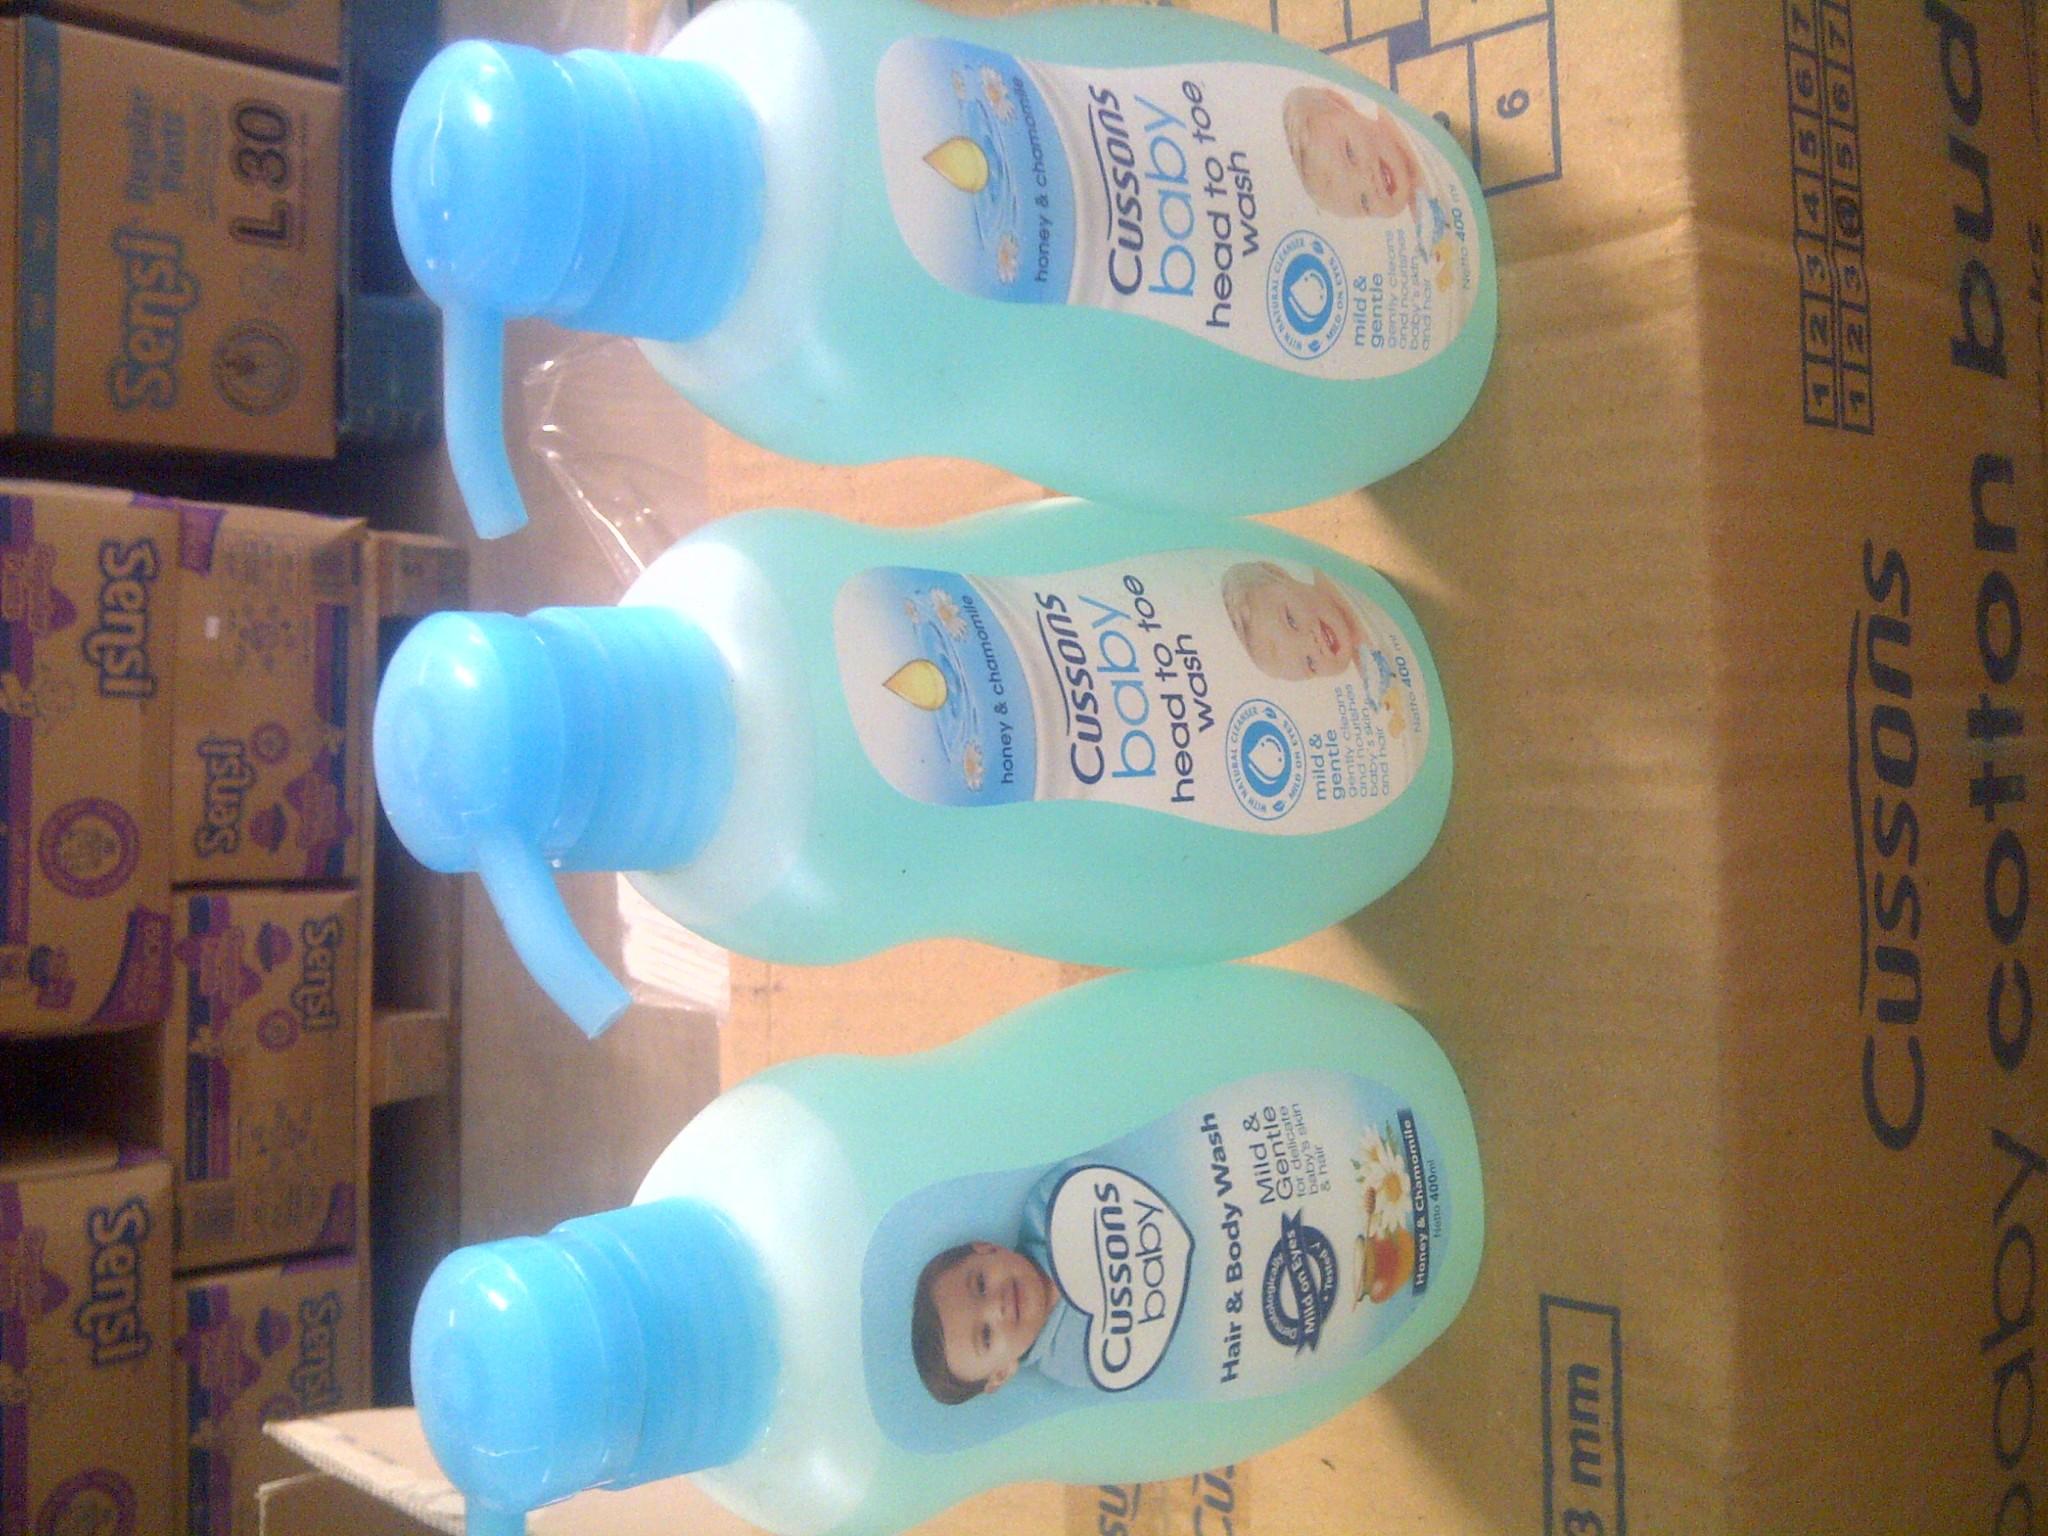 Jual Cb Hair Body Wash 400 Ml Mild Gentle Btl Toko Baby Cussons 400ml Tokopedia